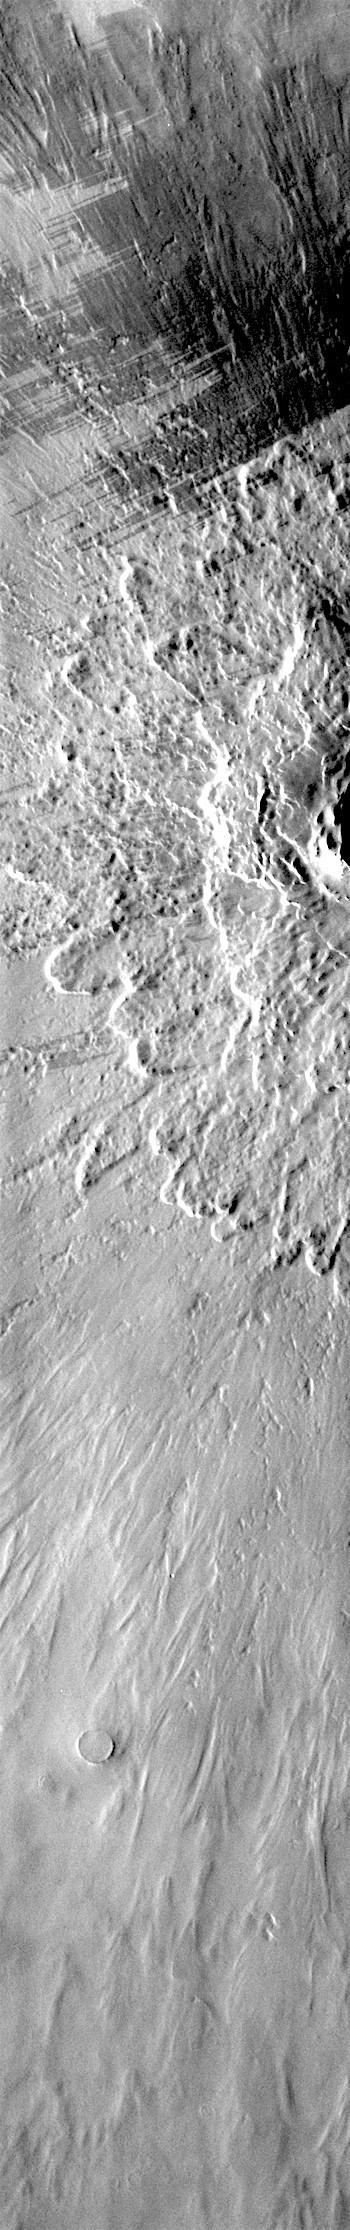 Blast zone around Lonar Crater (THEMIS_IOTD_20180507)